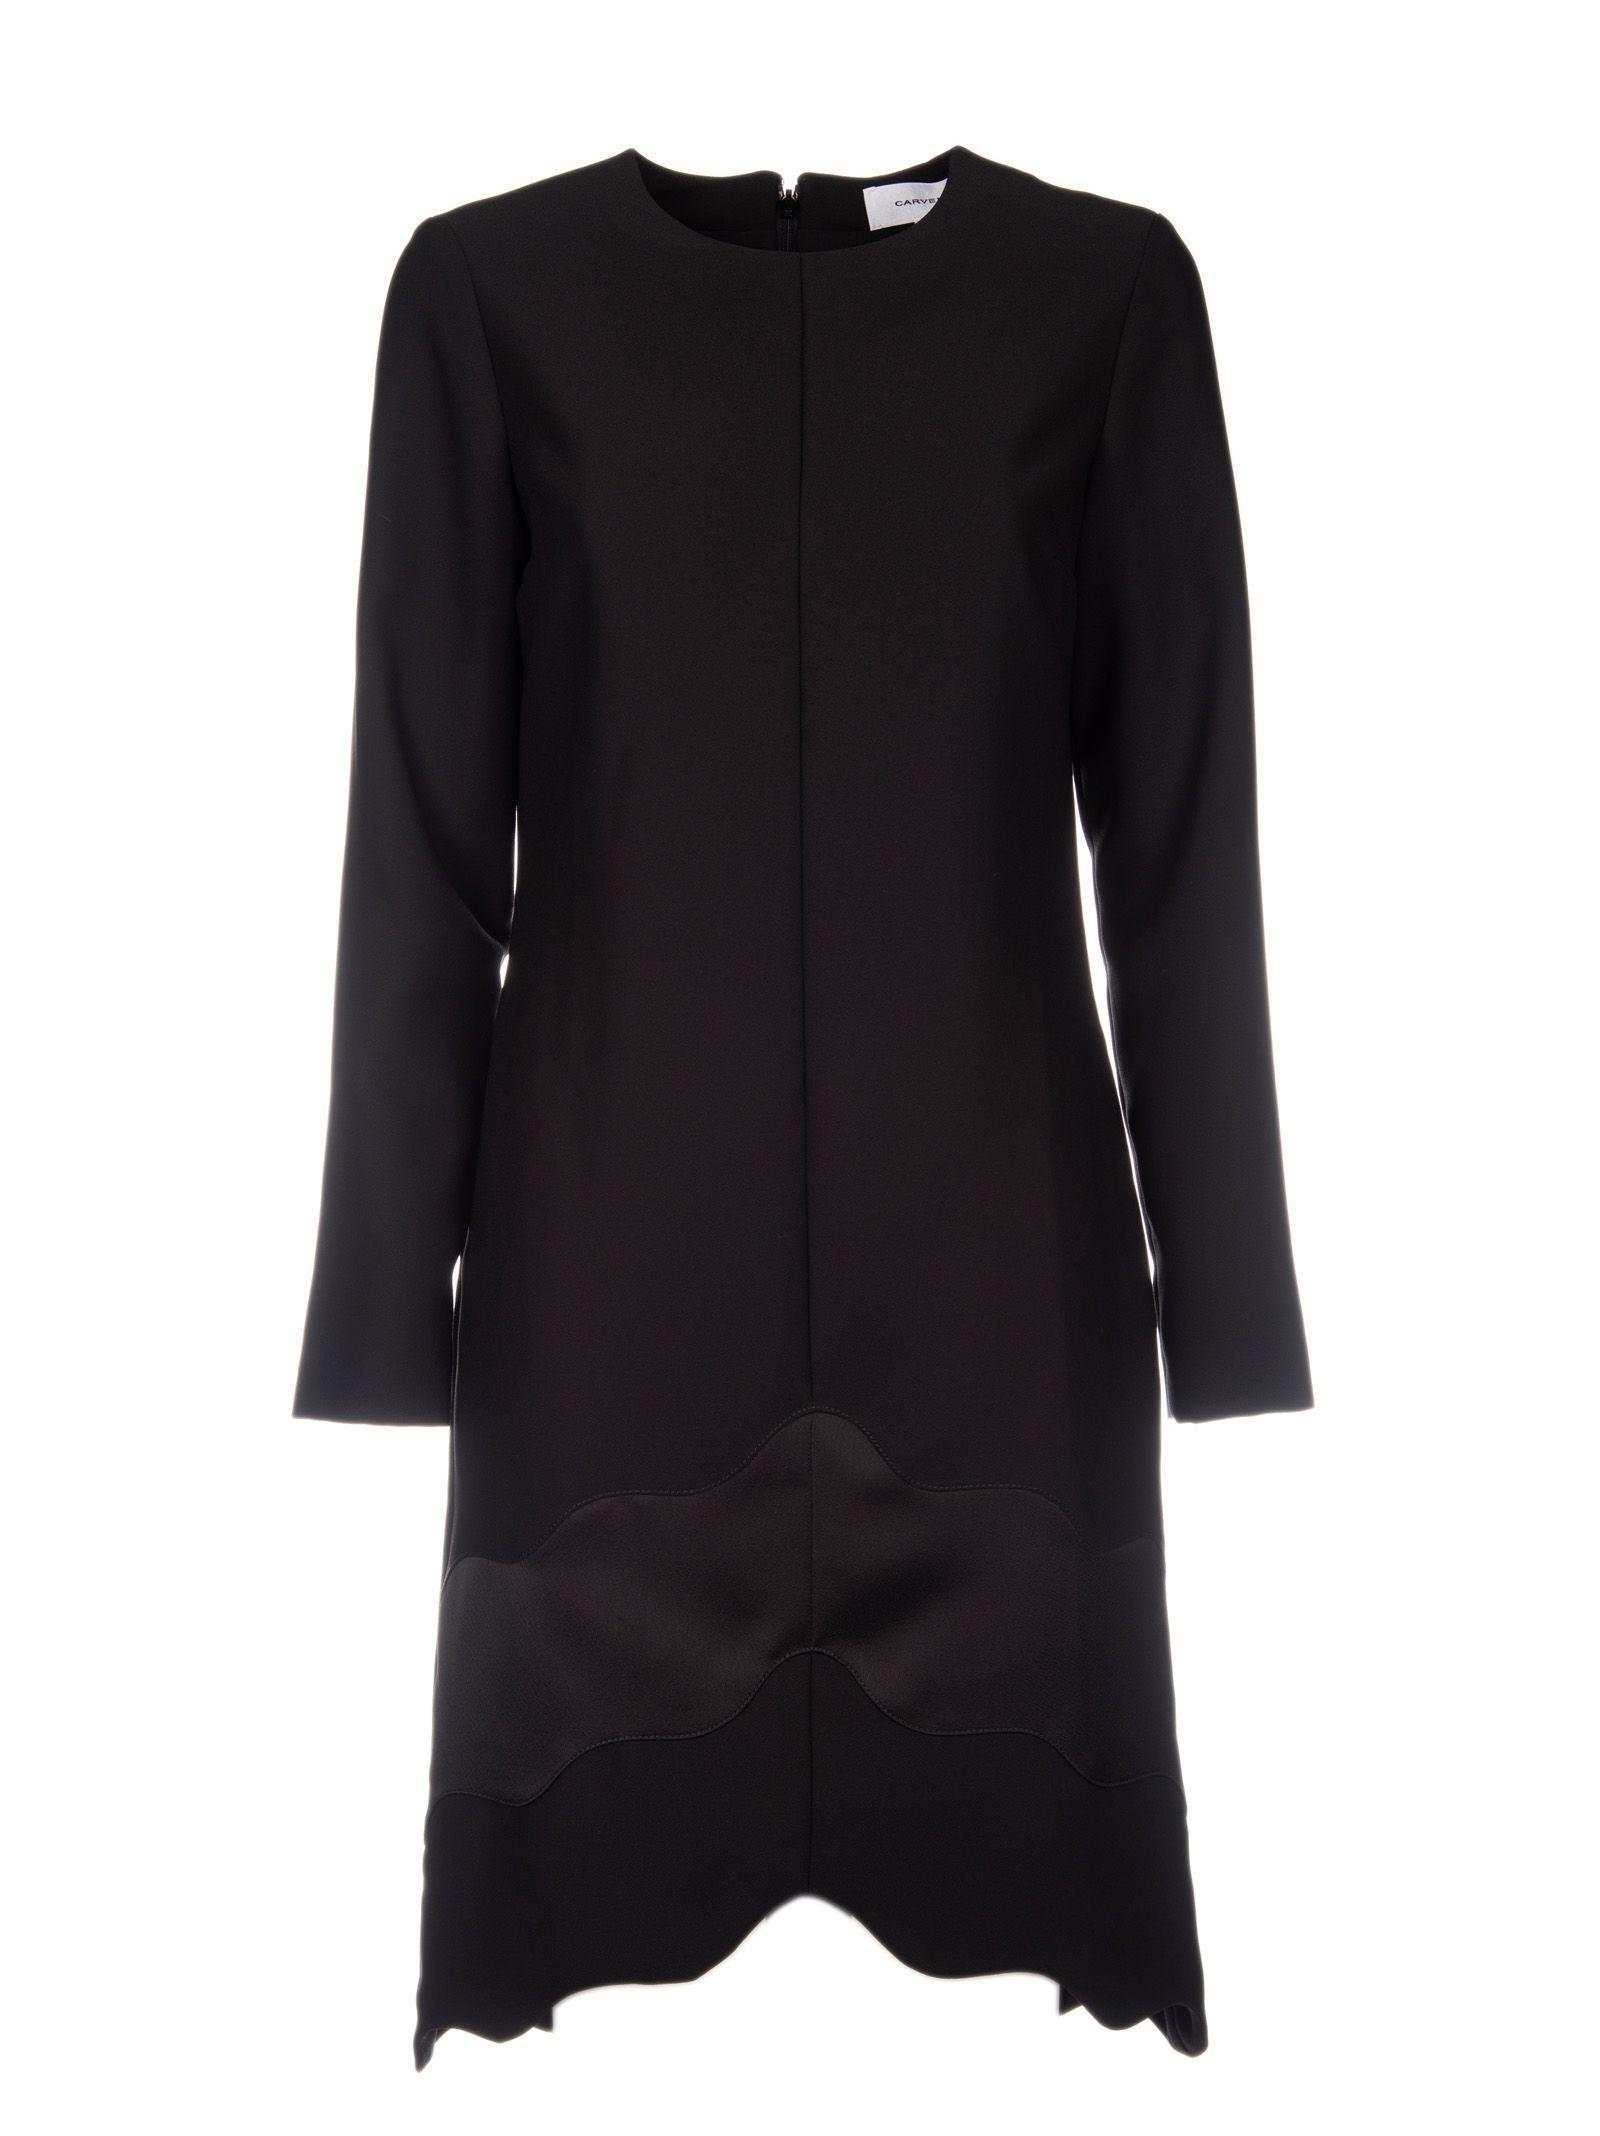 Carven Cady Dress In Black